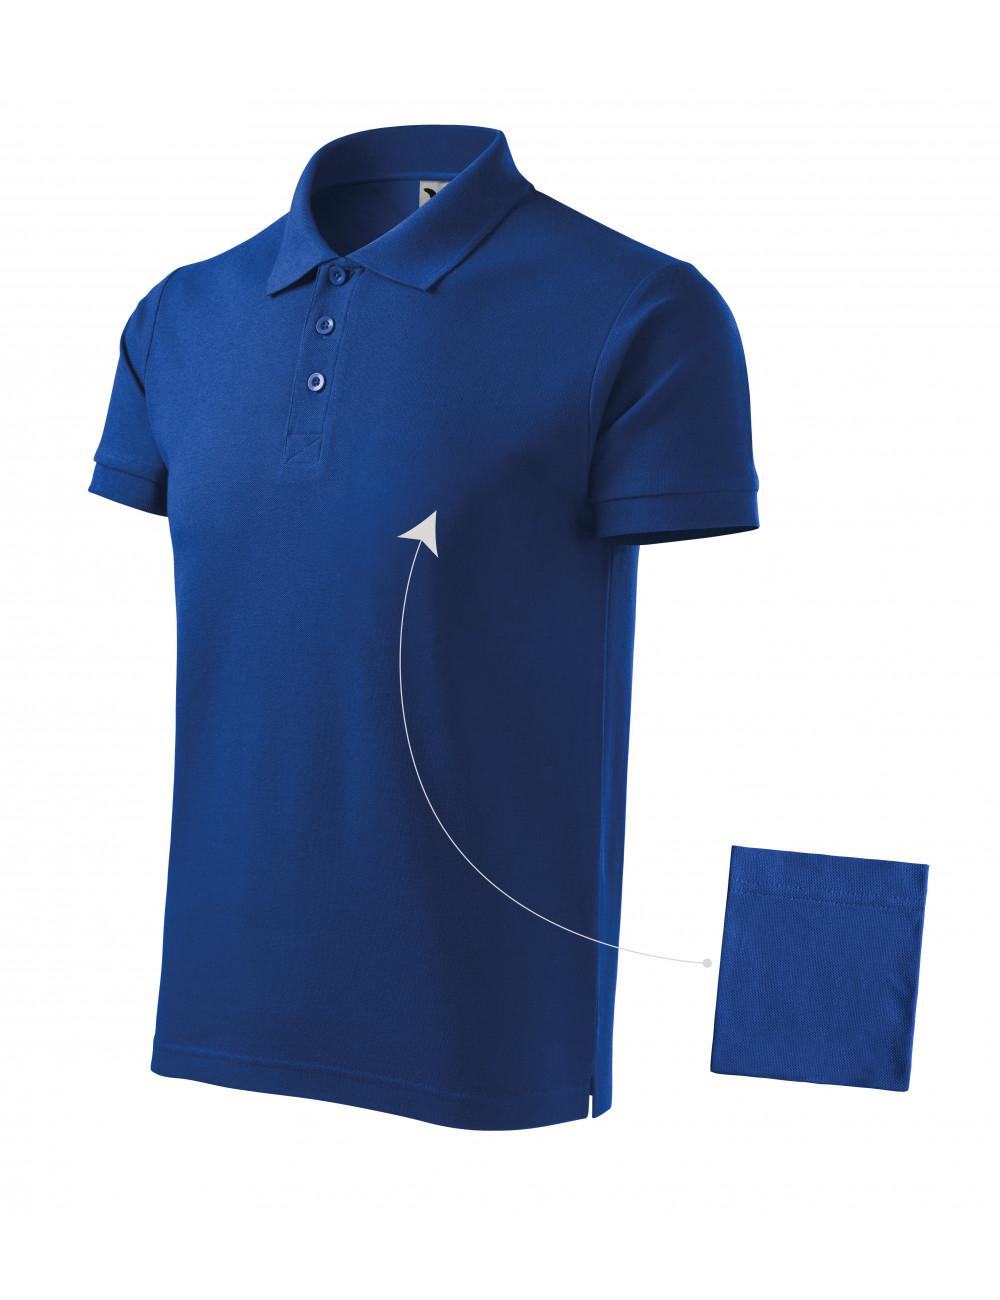 Adler MALFINI Koszulka polo męska Cotton 212 chabrowy